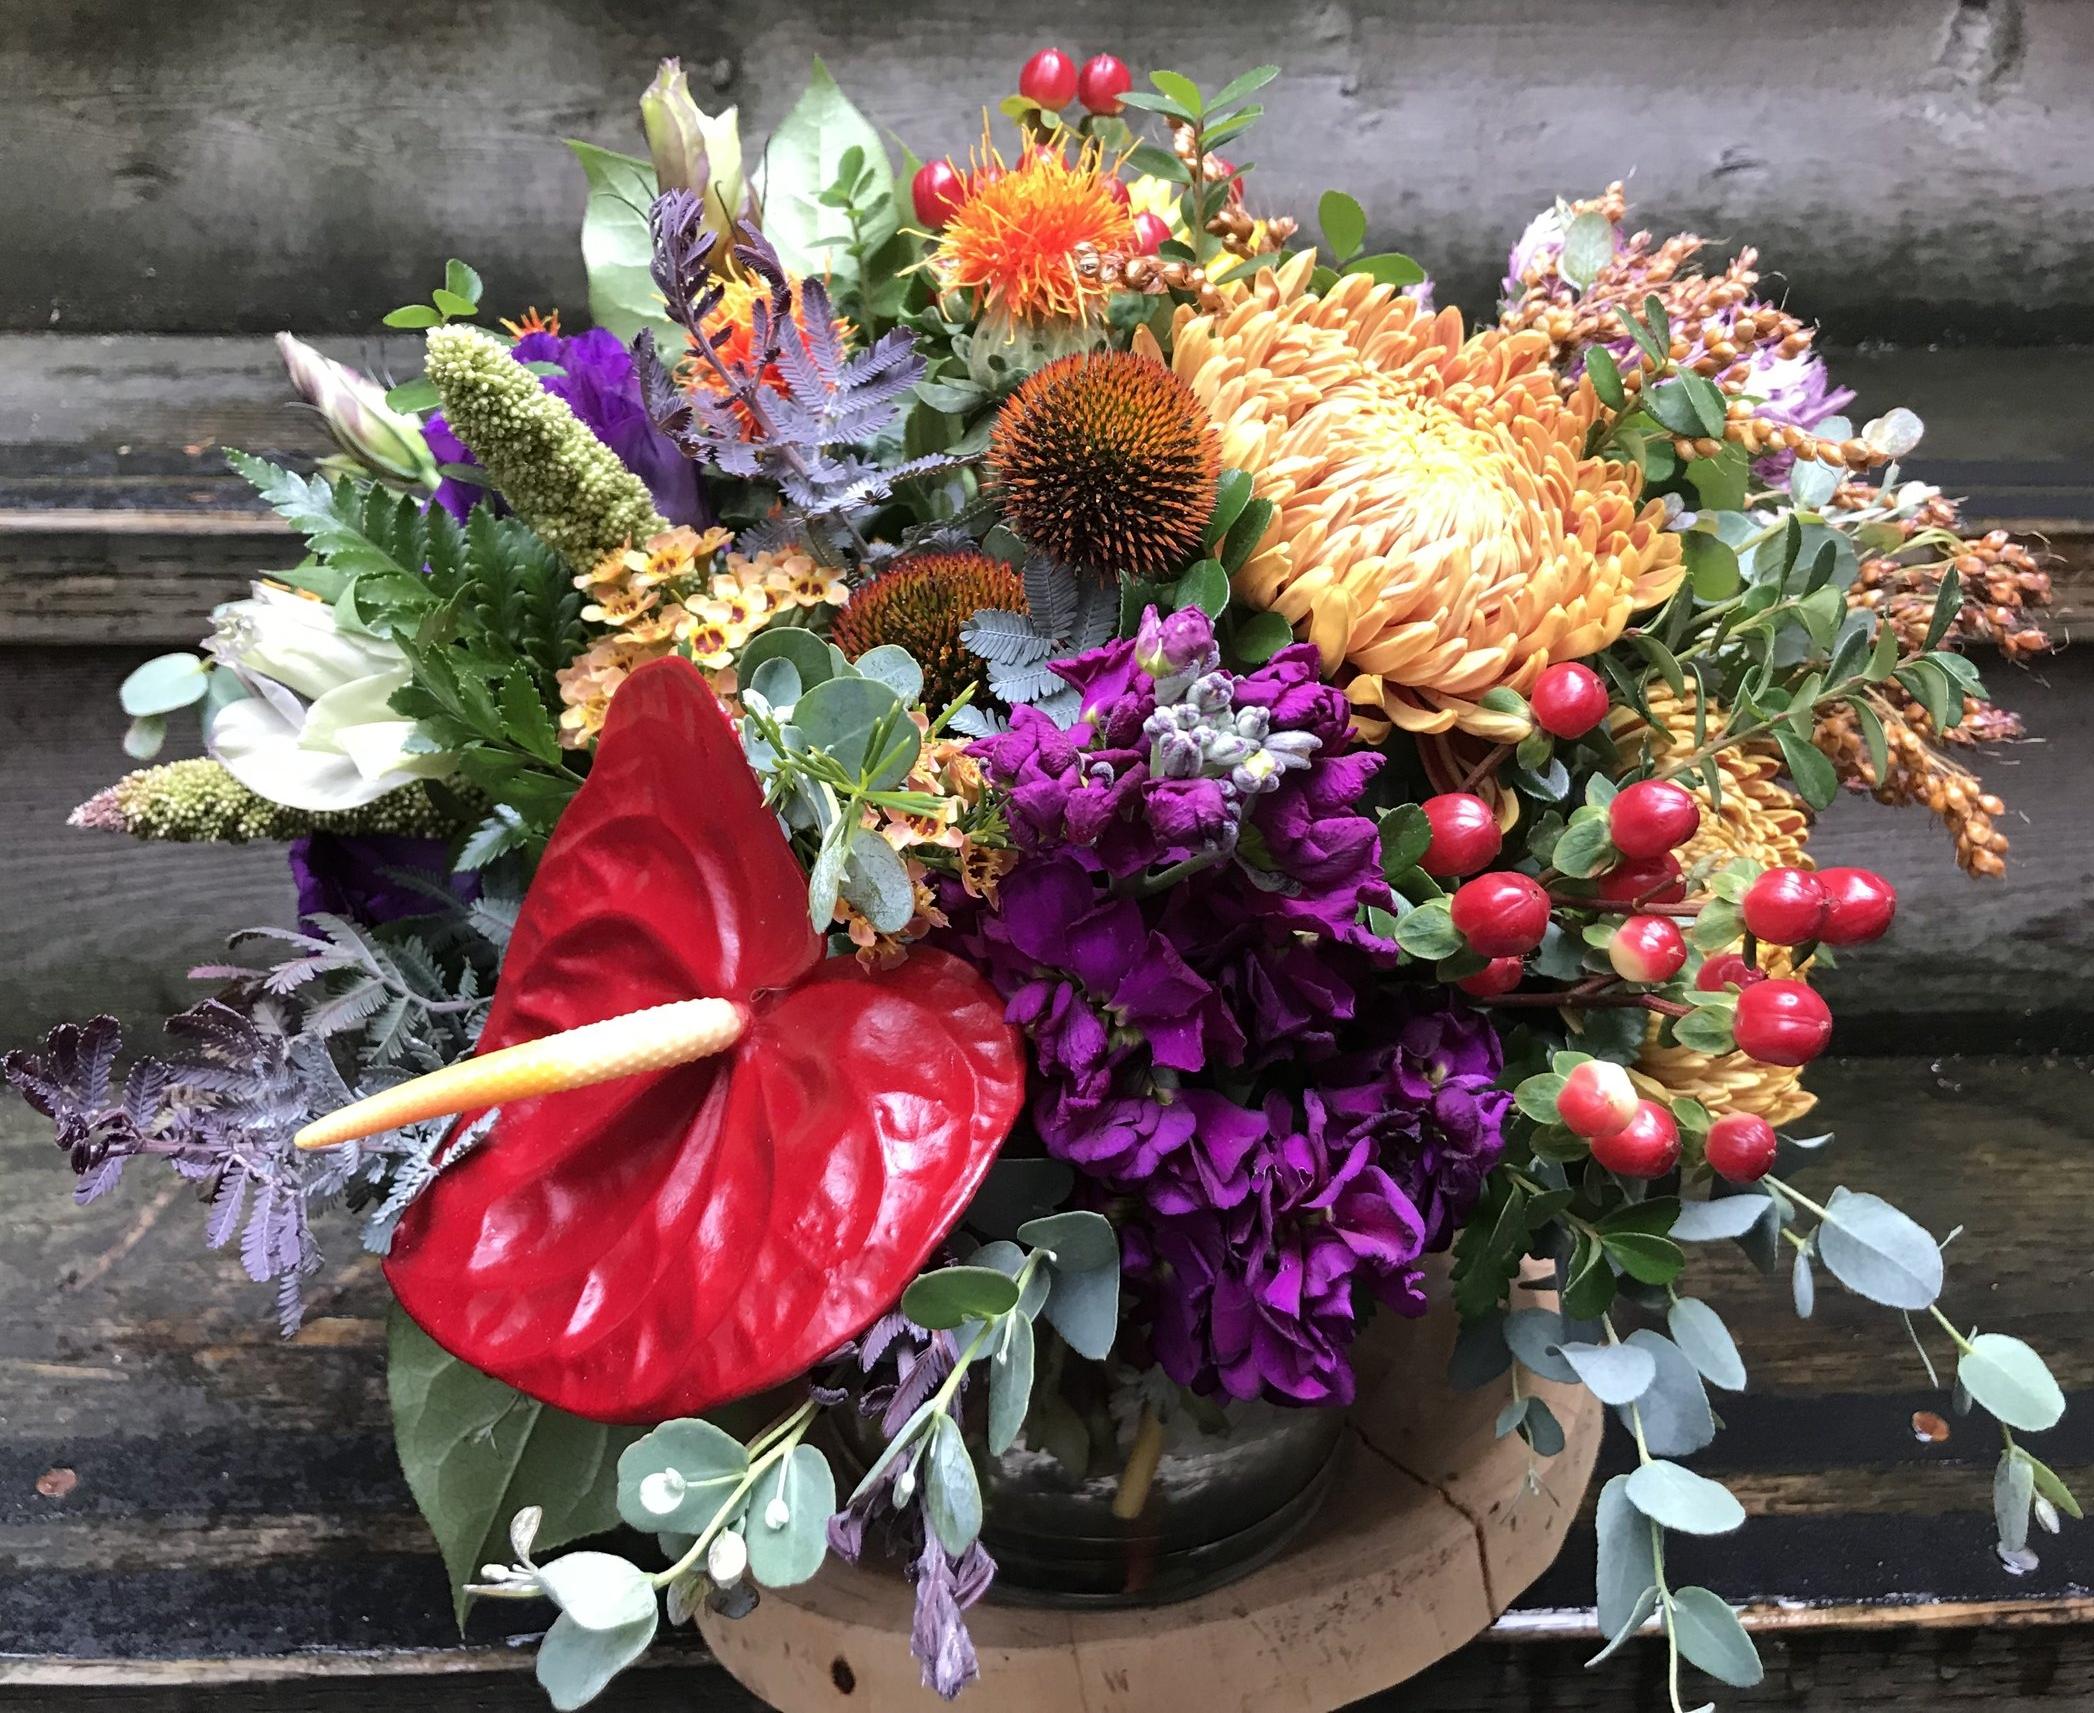 6. Eclectic and Colorful Autumn Arrangement